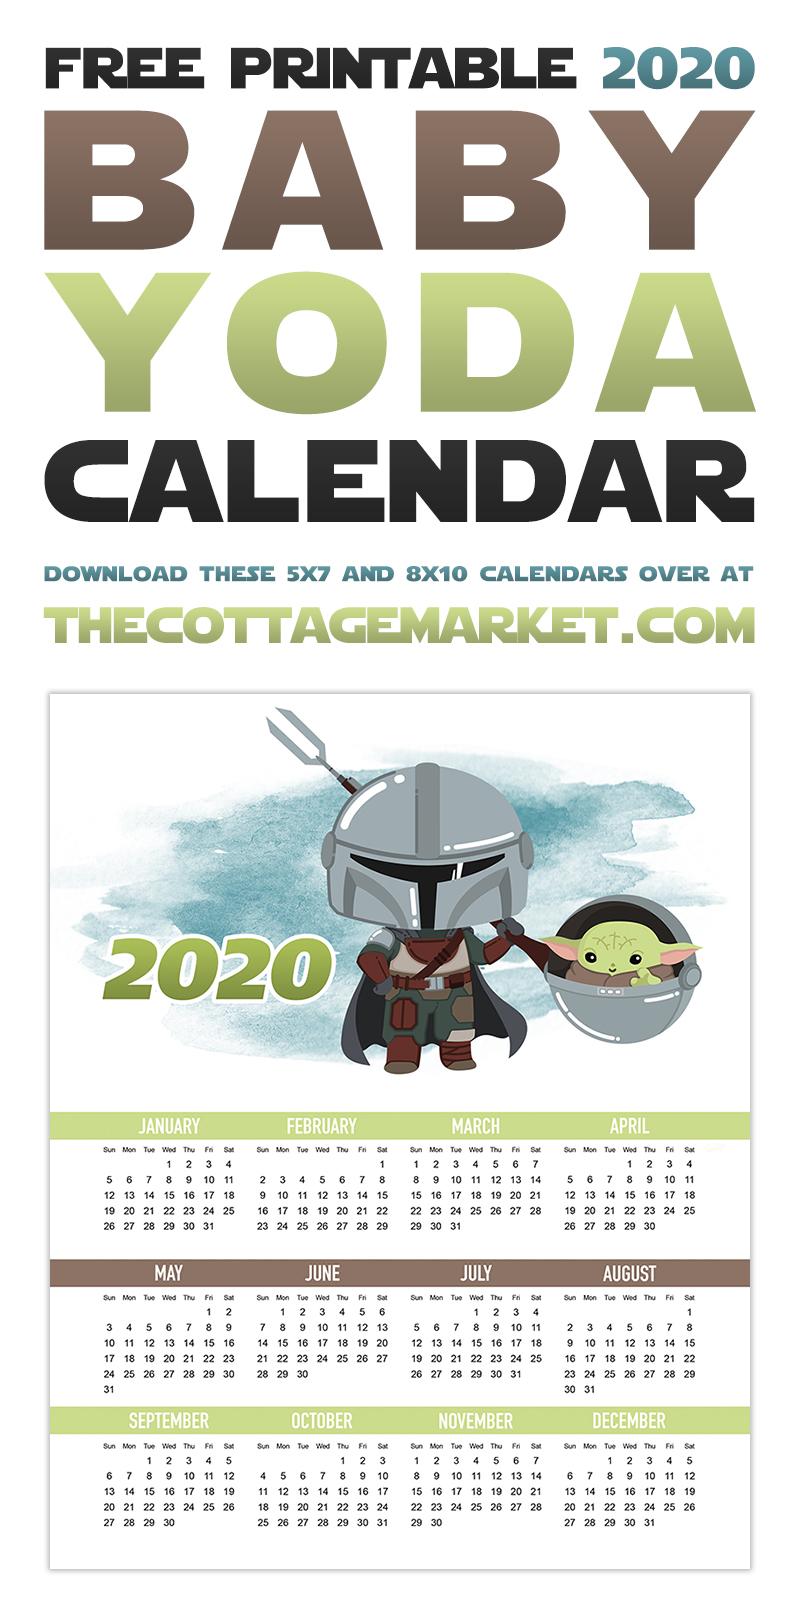 https://thecottagemarket.com/wp-content/uploads/2019/12/TCM-BabyYoda-OnePage-2020-Calendar-t-1.jpg